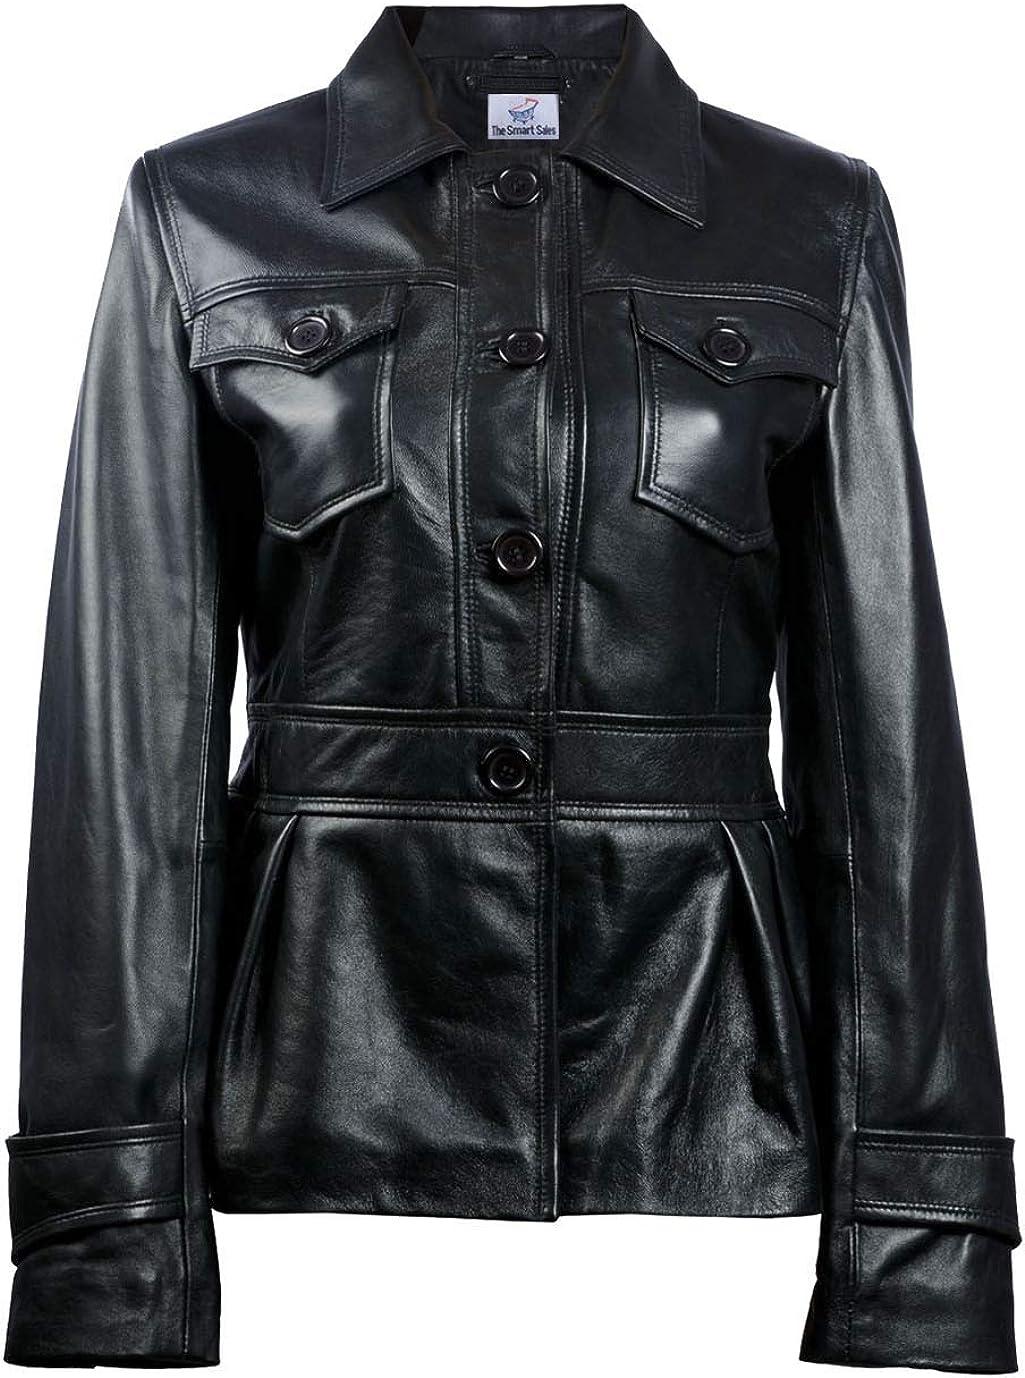 TheSmartSales Metropolis Black Womens Leather Blazer PU Leather Jacket